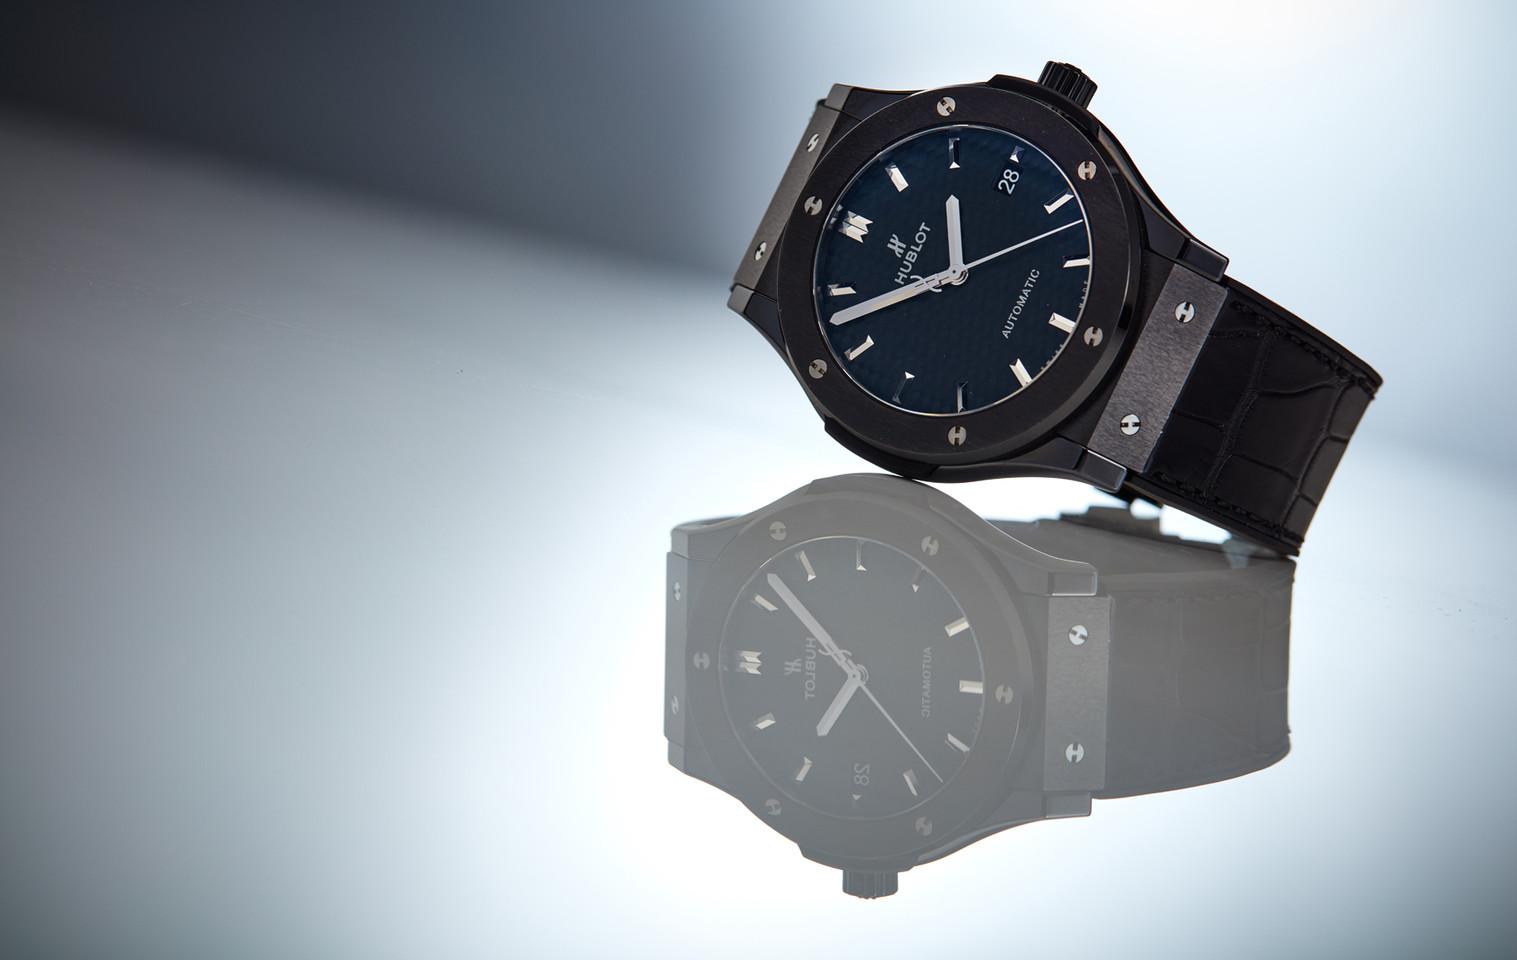 Hublot Timepieces